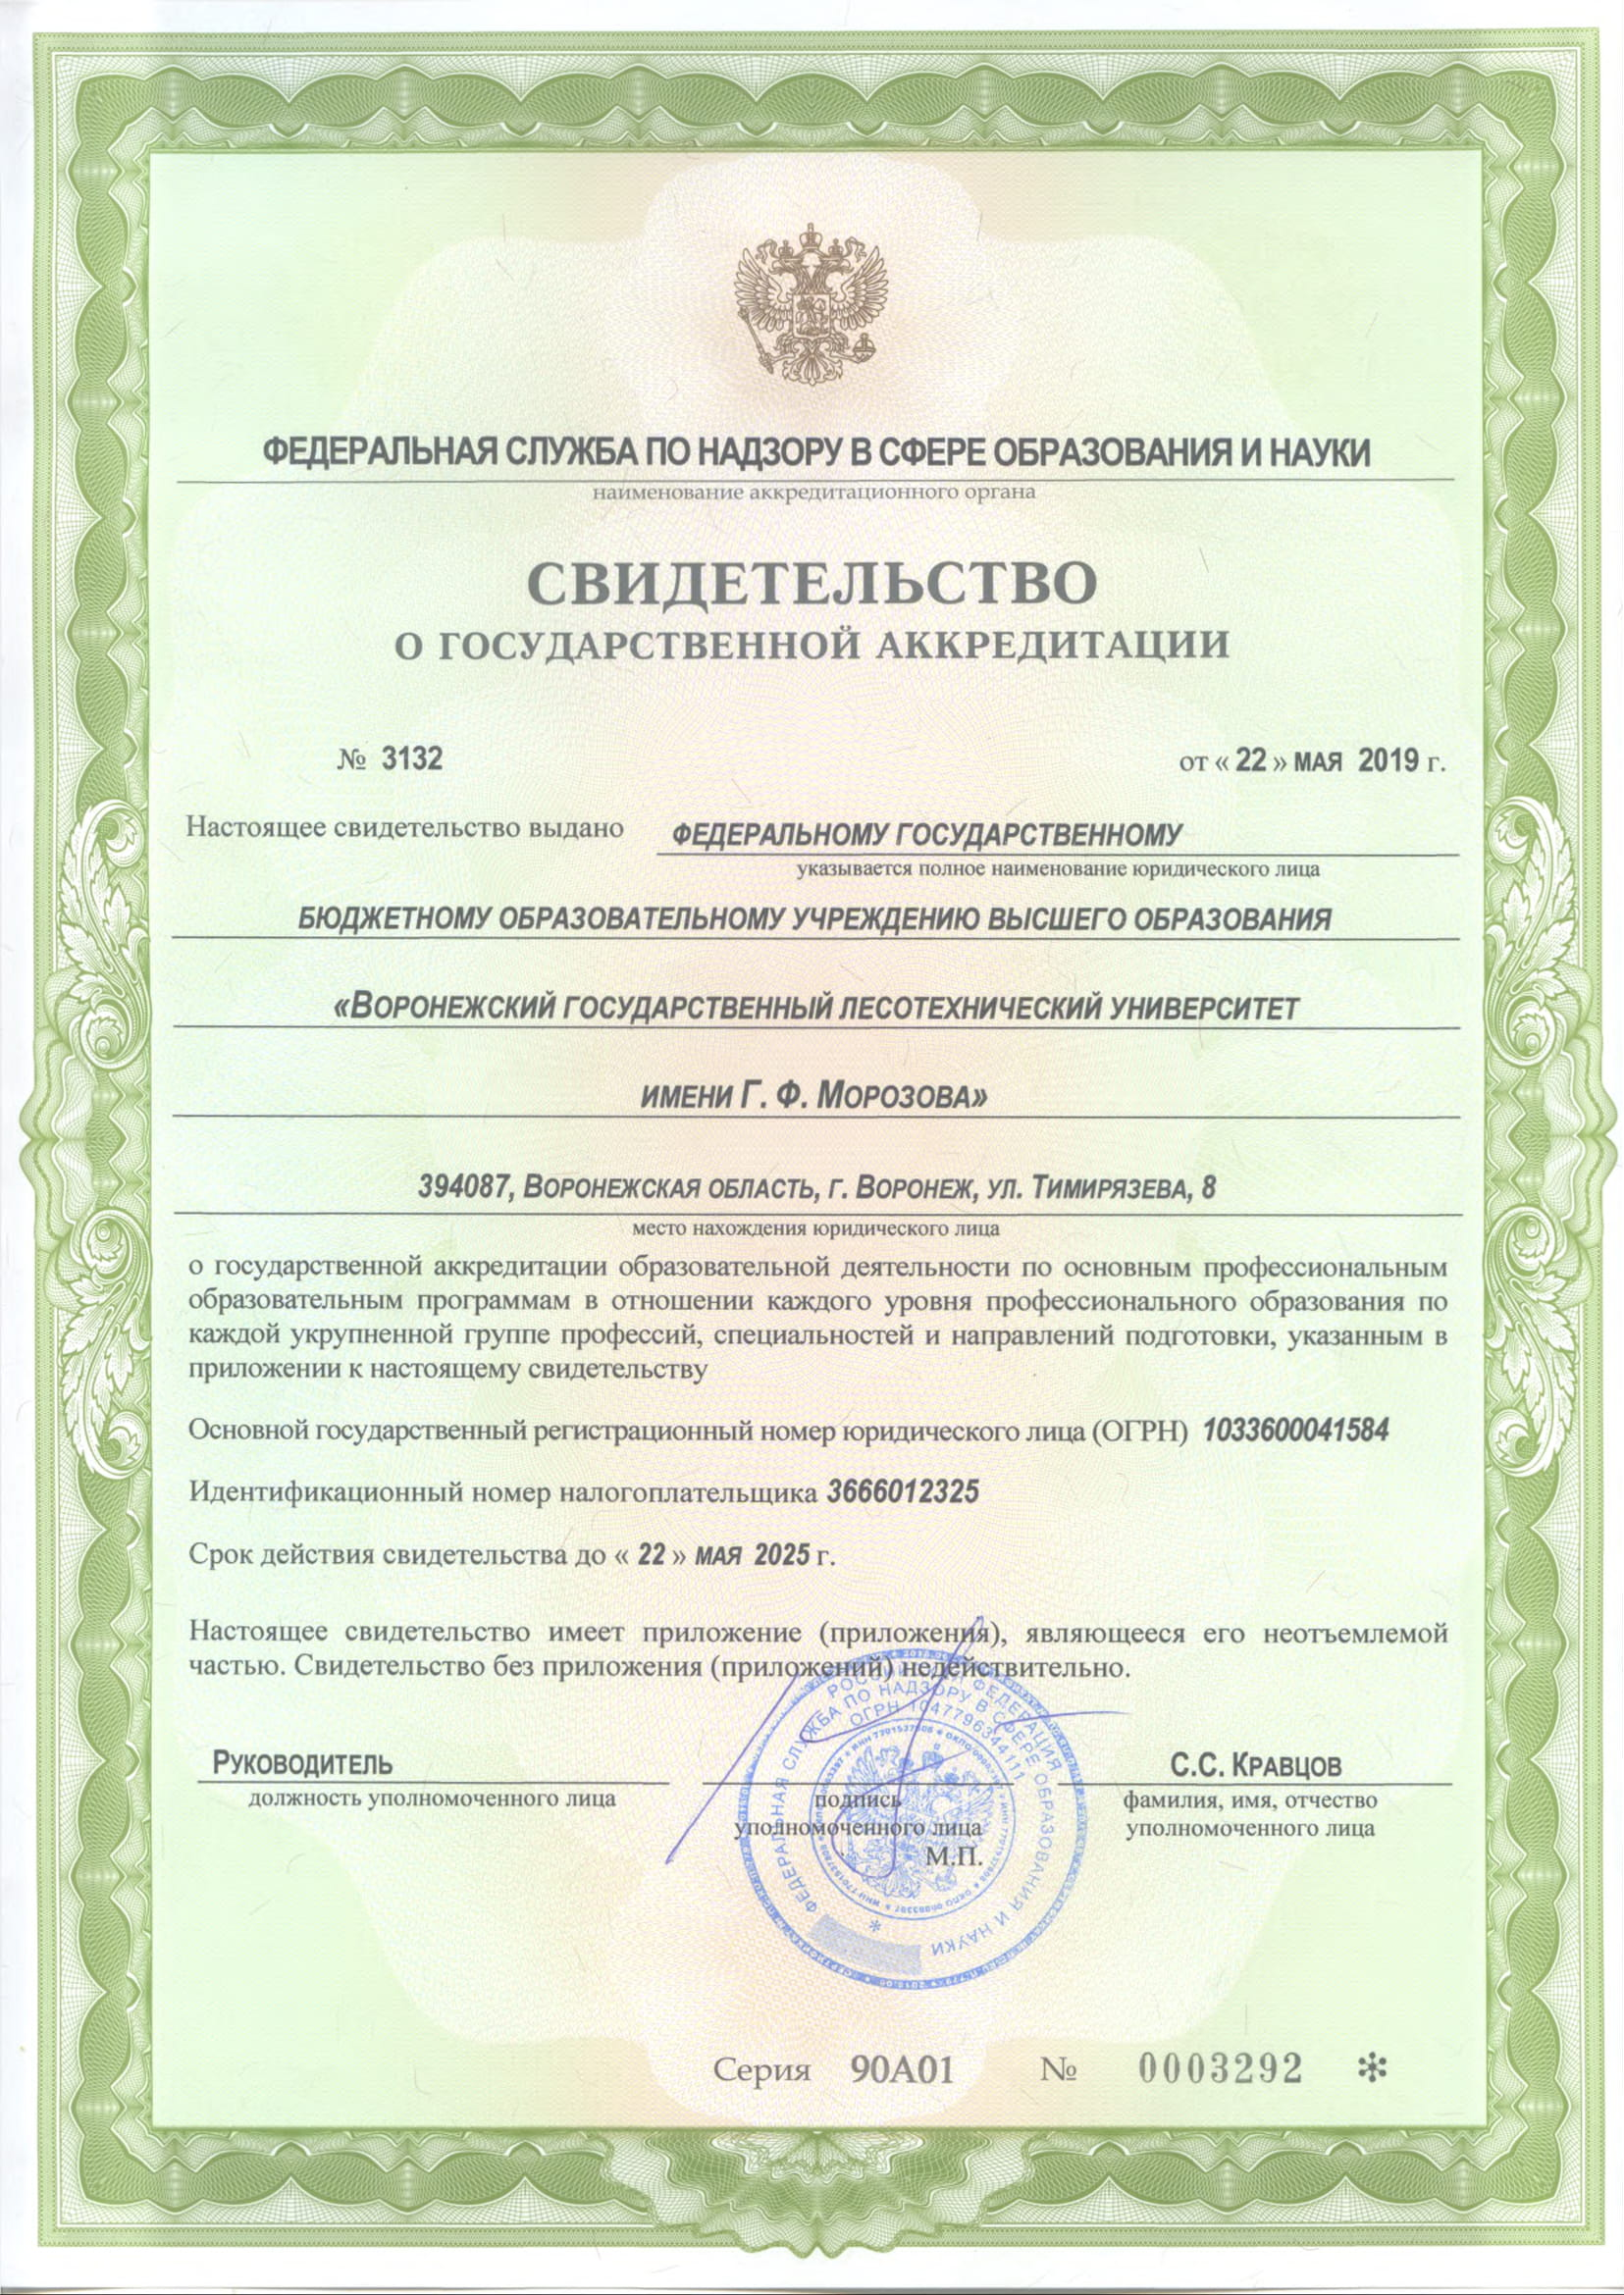 http://departamentvpo.ru/wp-content/uploads/2019/06/akkreditacija-vglu_22.05.19-1.jpg